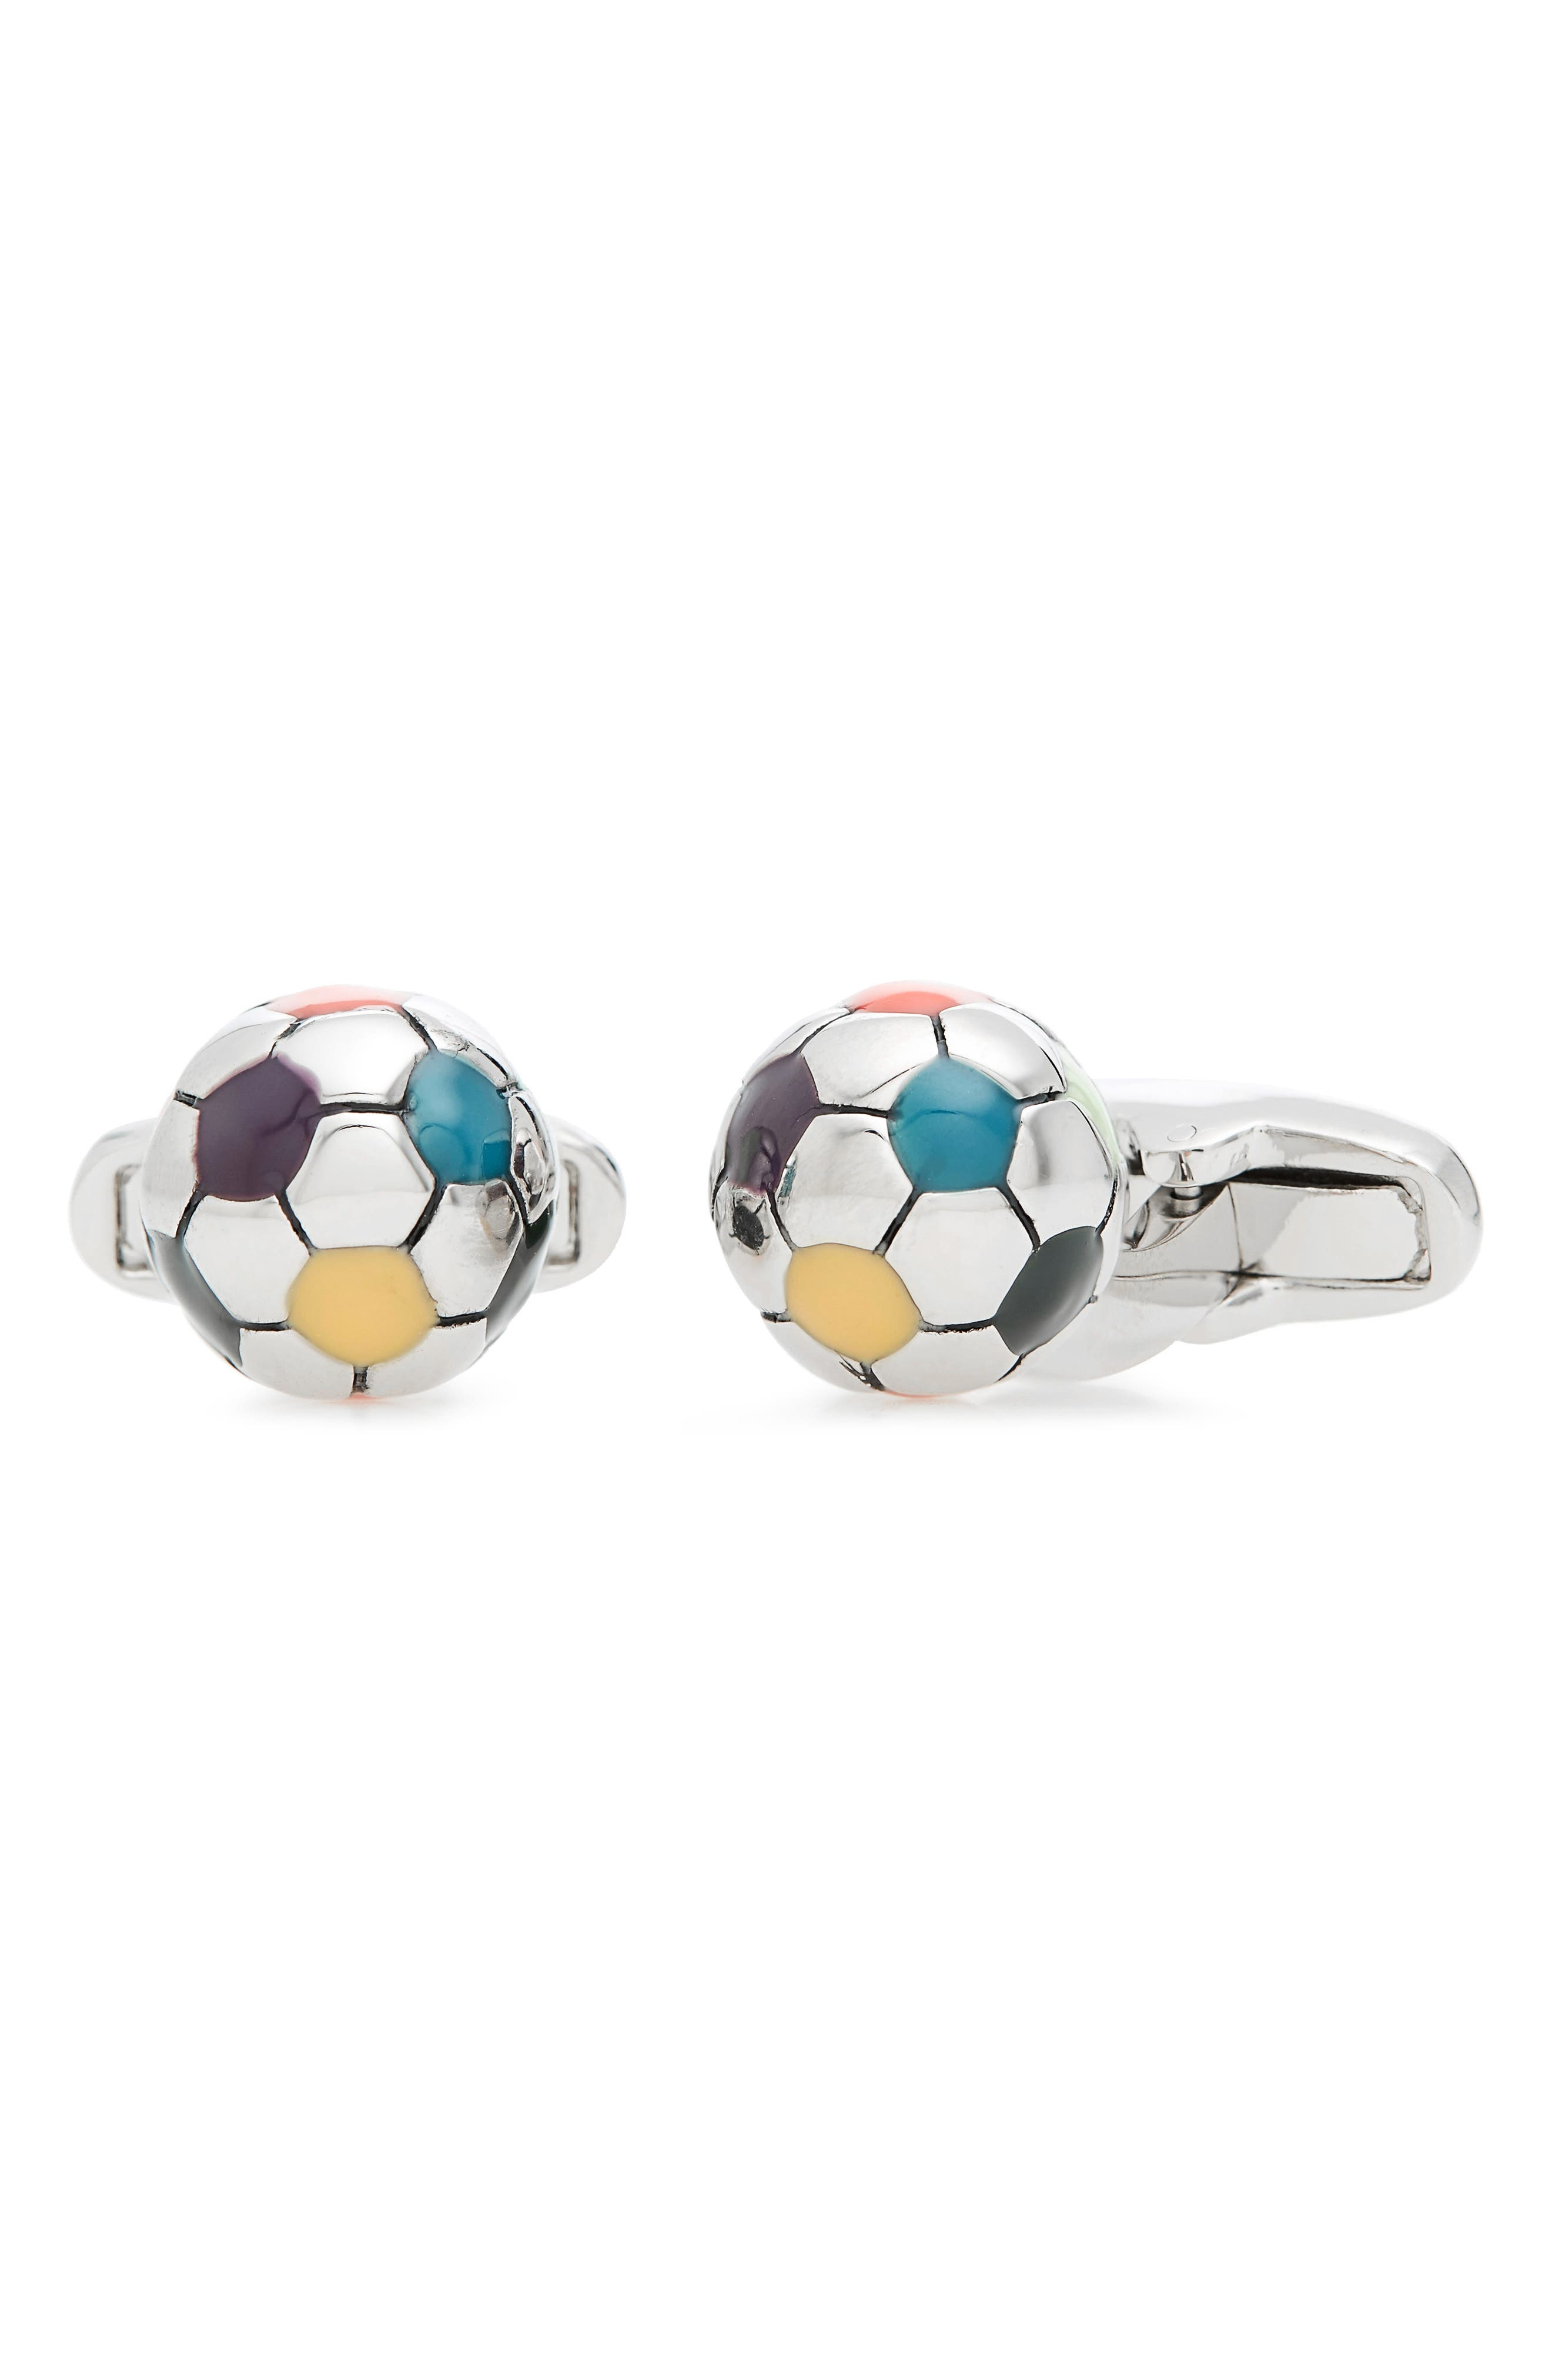 Football Cuff Links,                         Main,                         color, COPPER